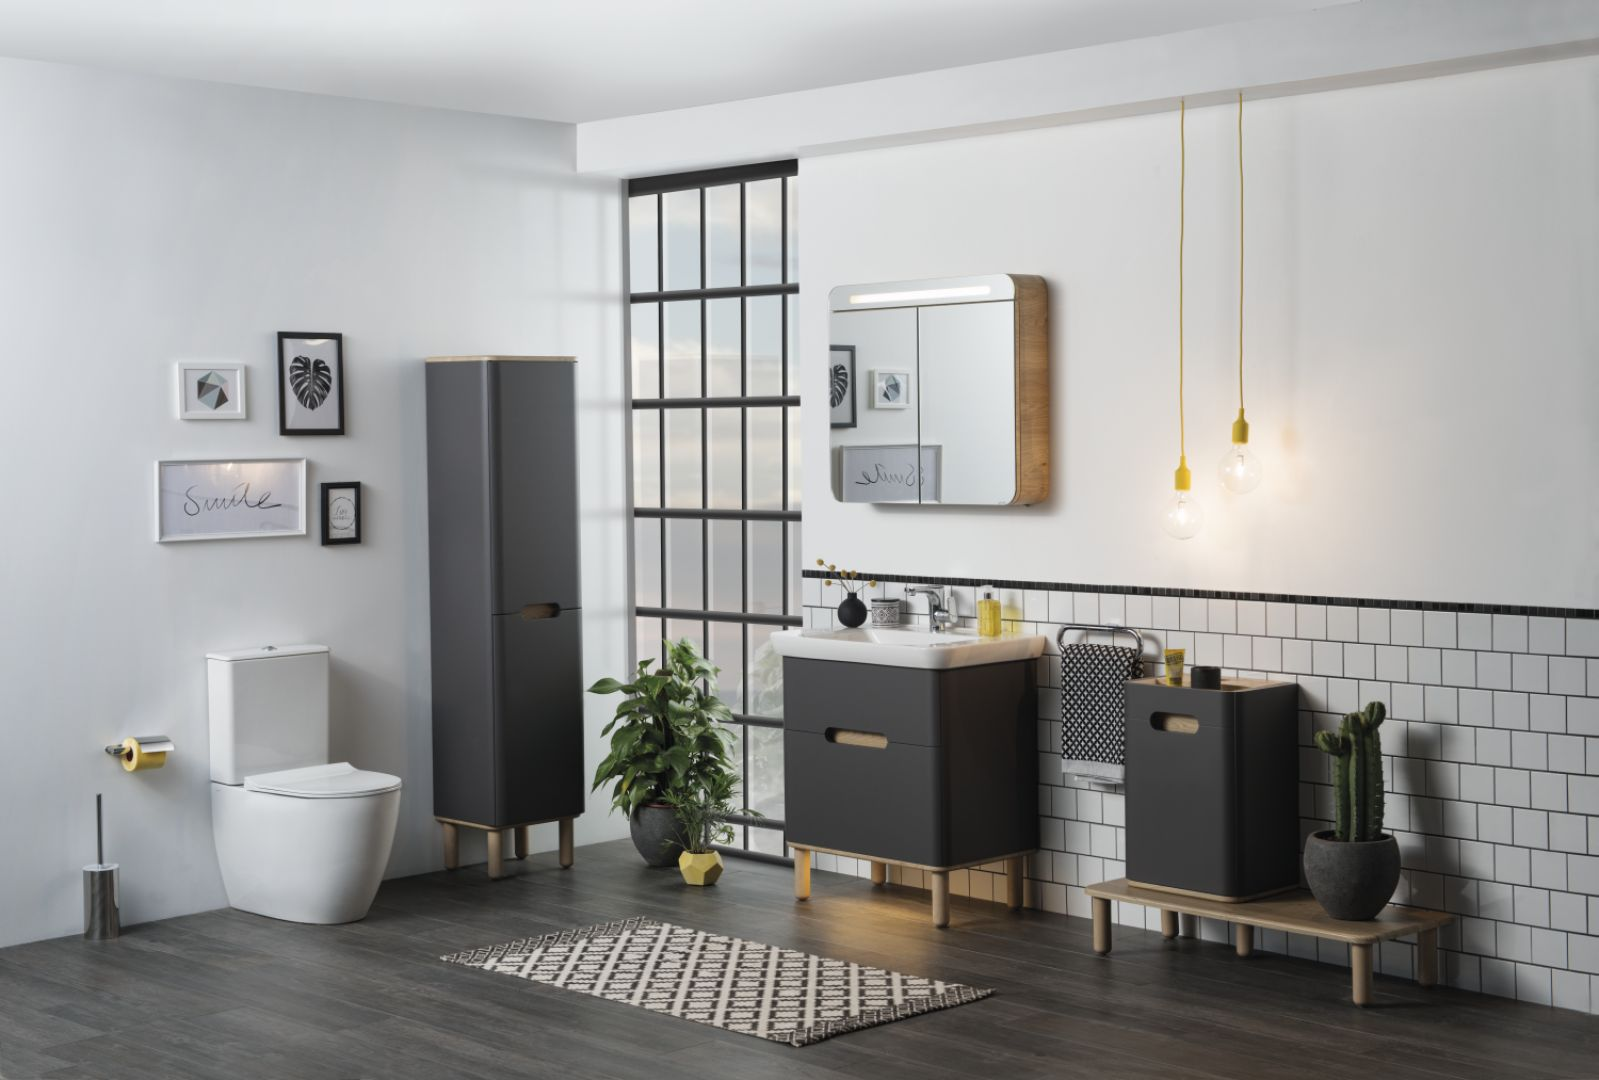 Ciemne meble łazienkowe z kolekcji Sento marki VitrA. Fot. VitrA